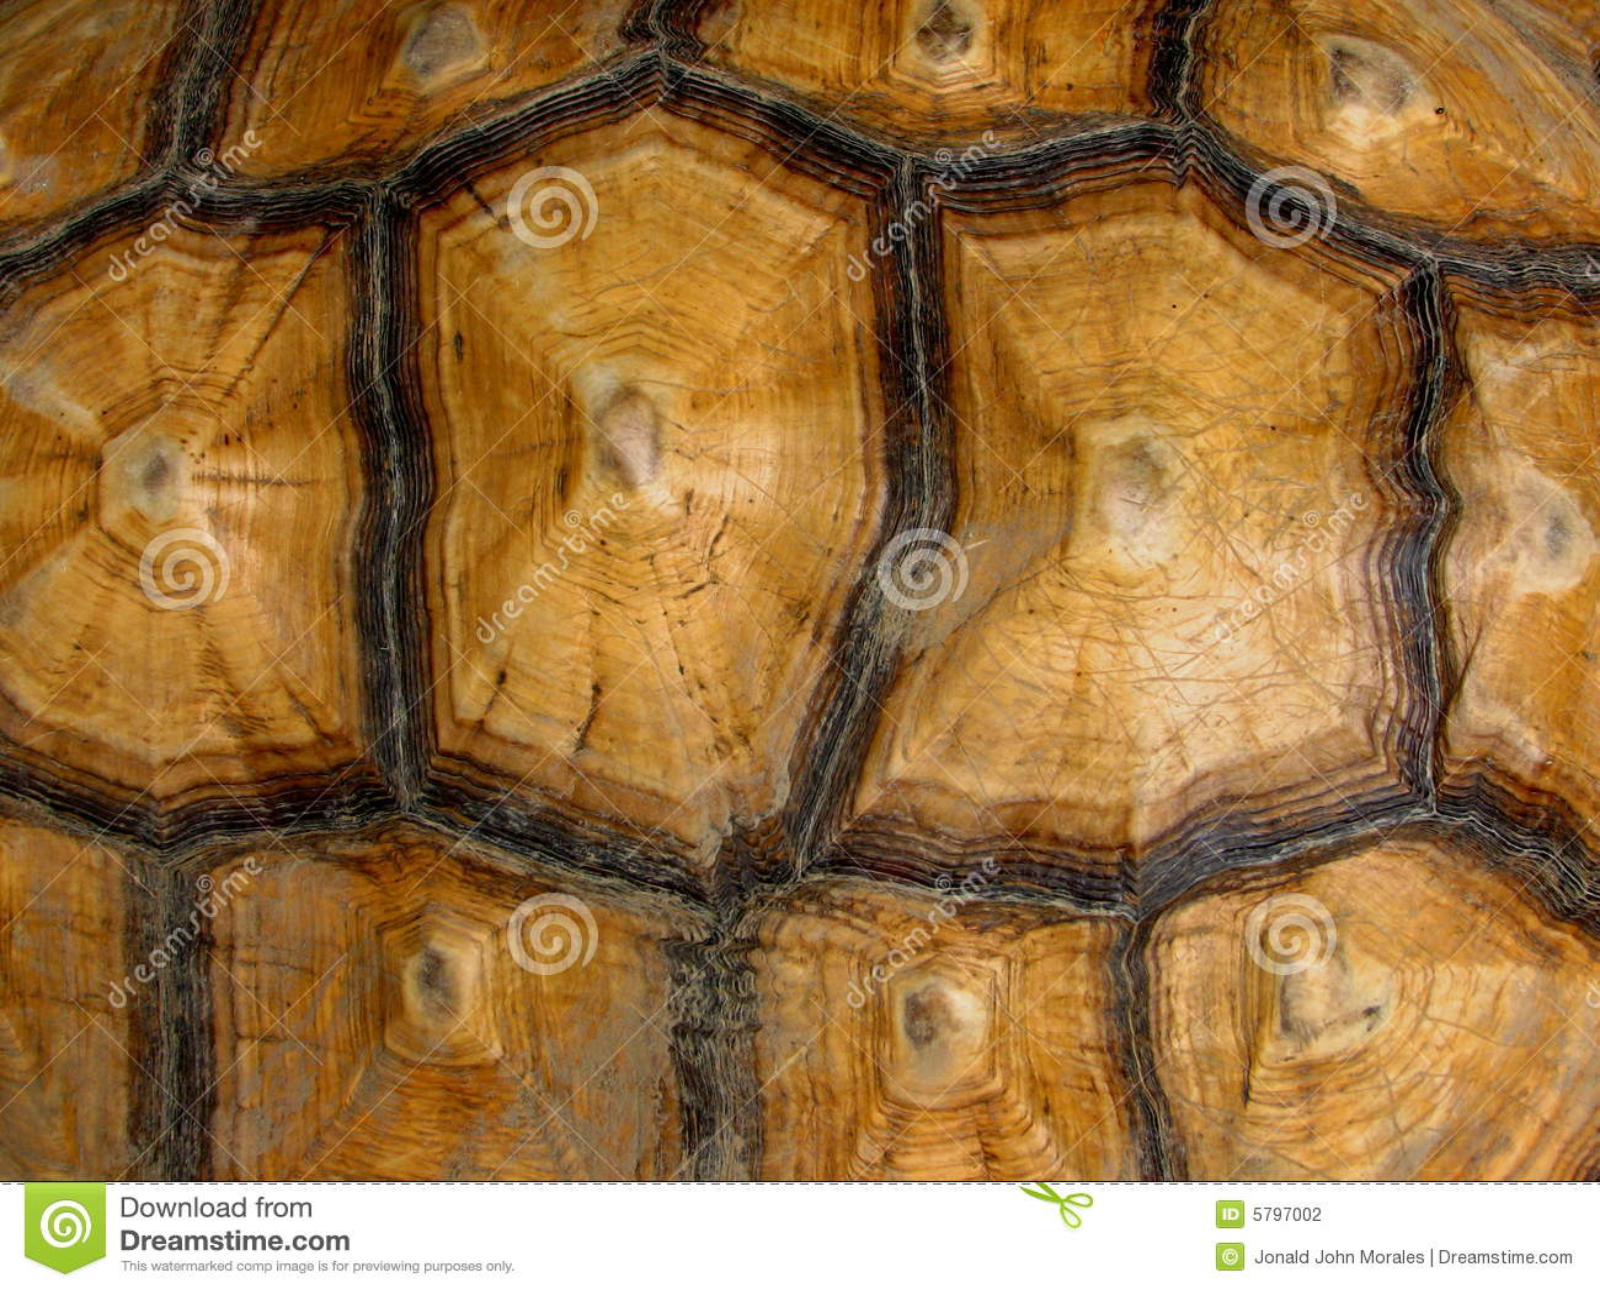 The Shield Hd Wallpaper Download Tortoise Shell Pattern Stock Photo Image Of Tortoise